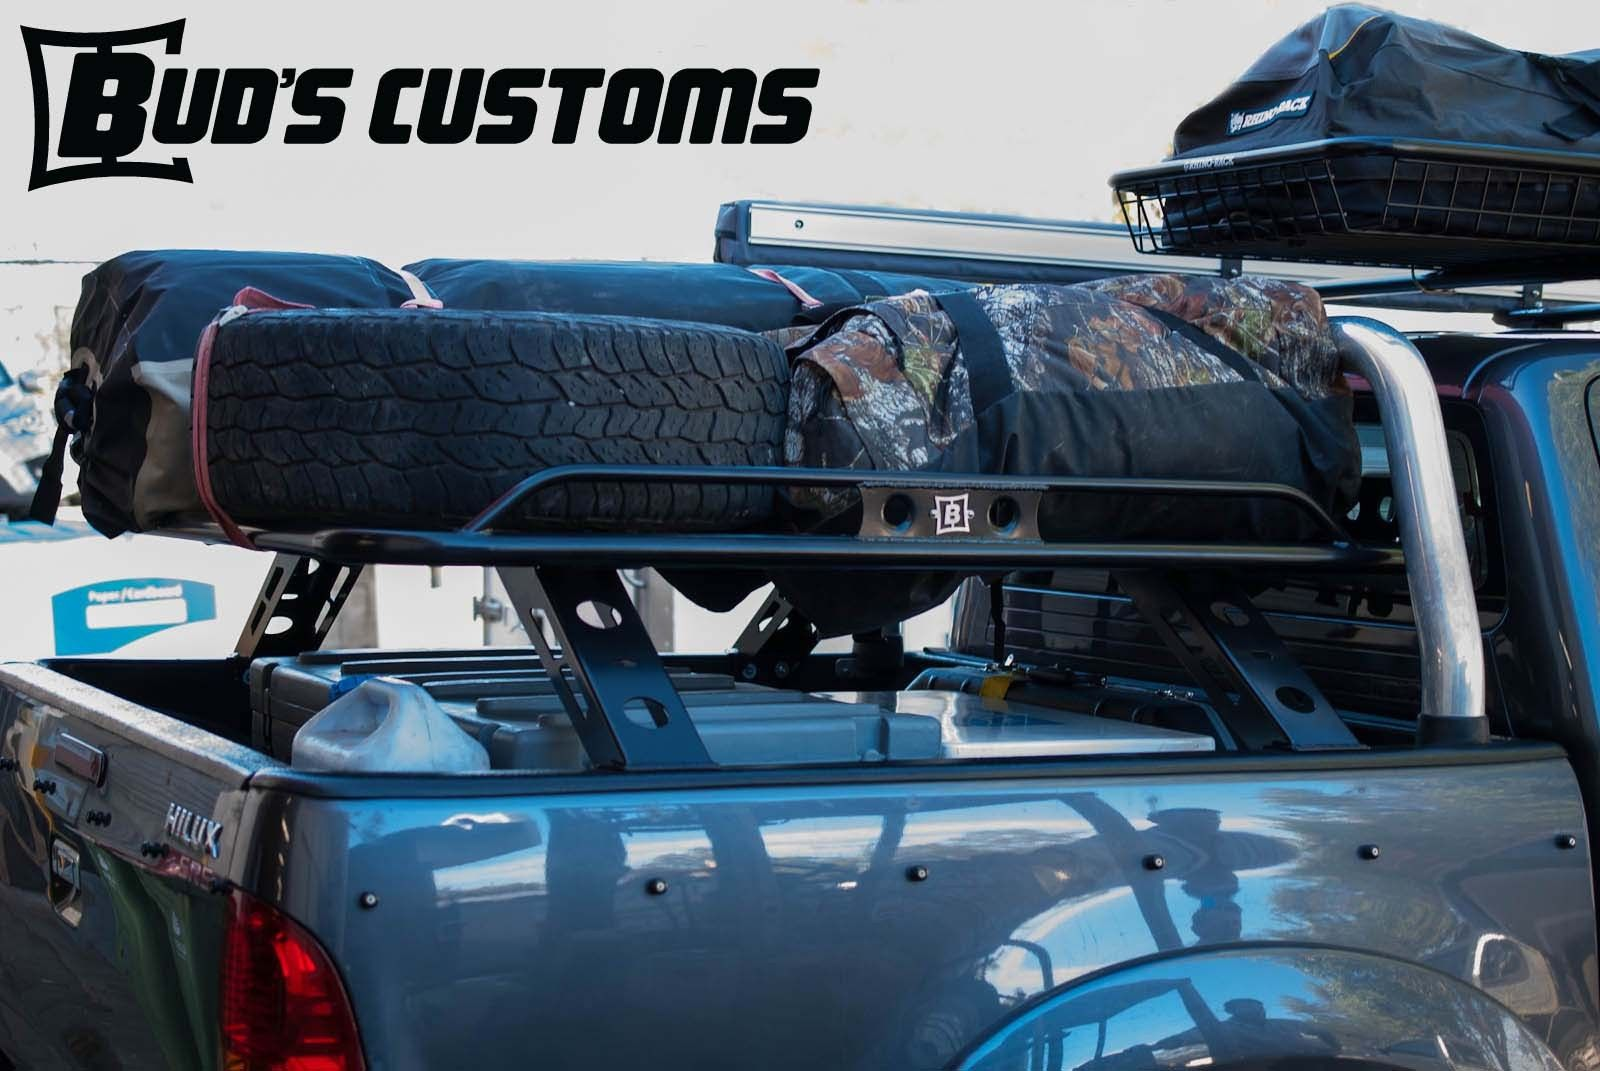 HILUX 05+ DUAL CAB 1.4M LONG TUB RACK - Buds Customs | Toyota ...